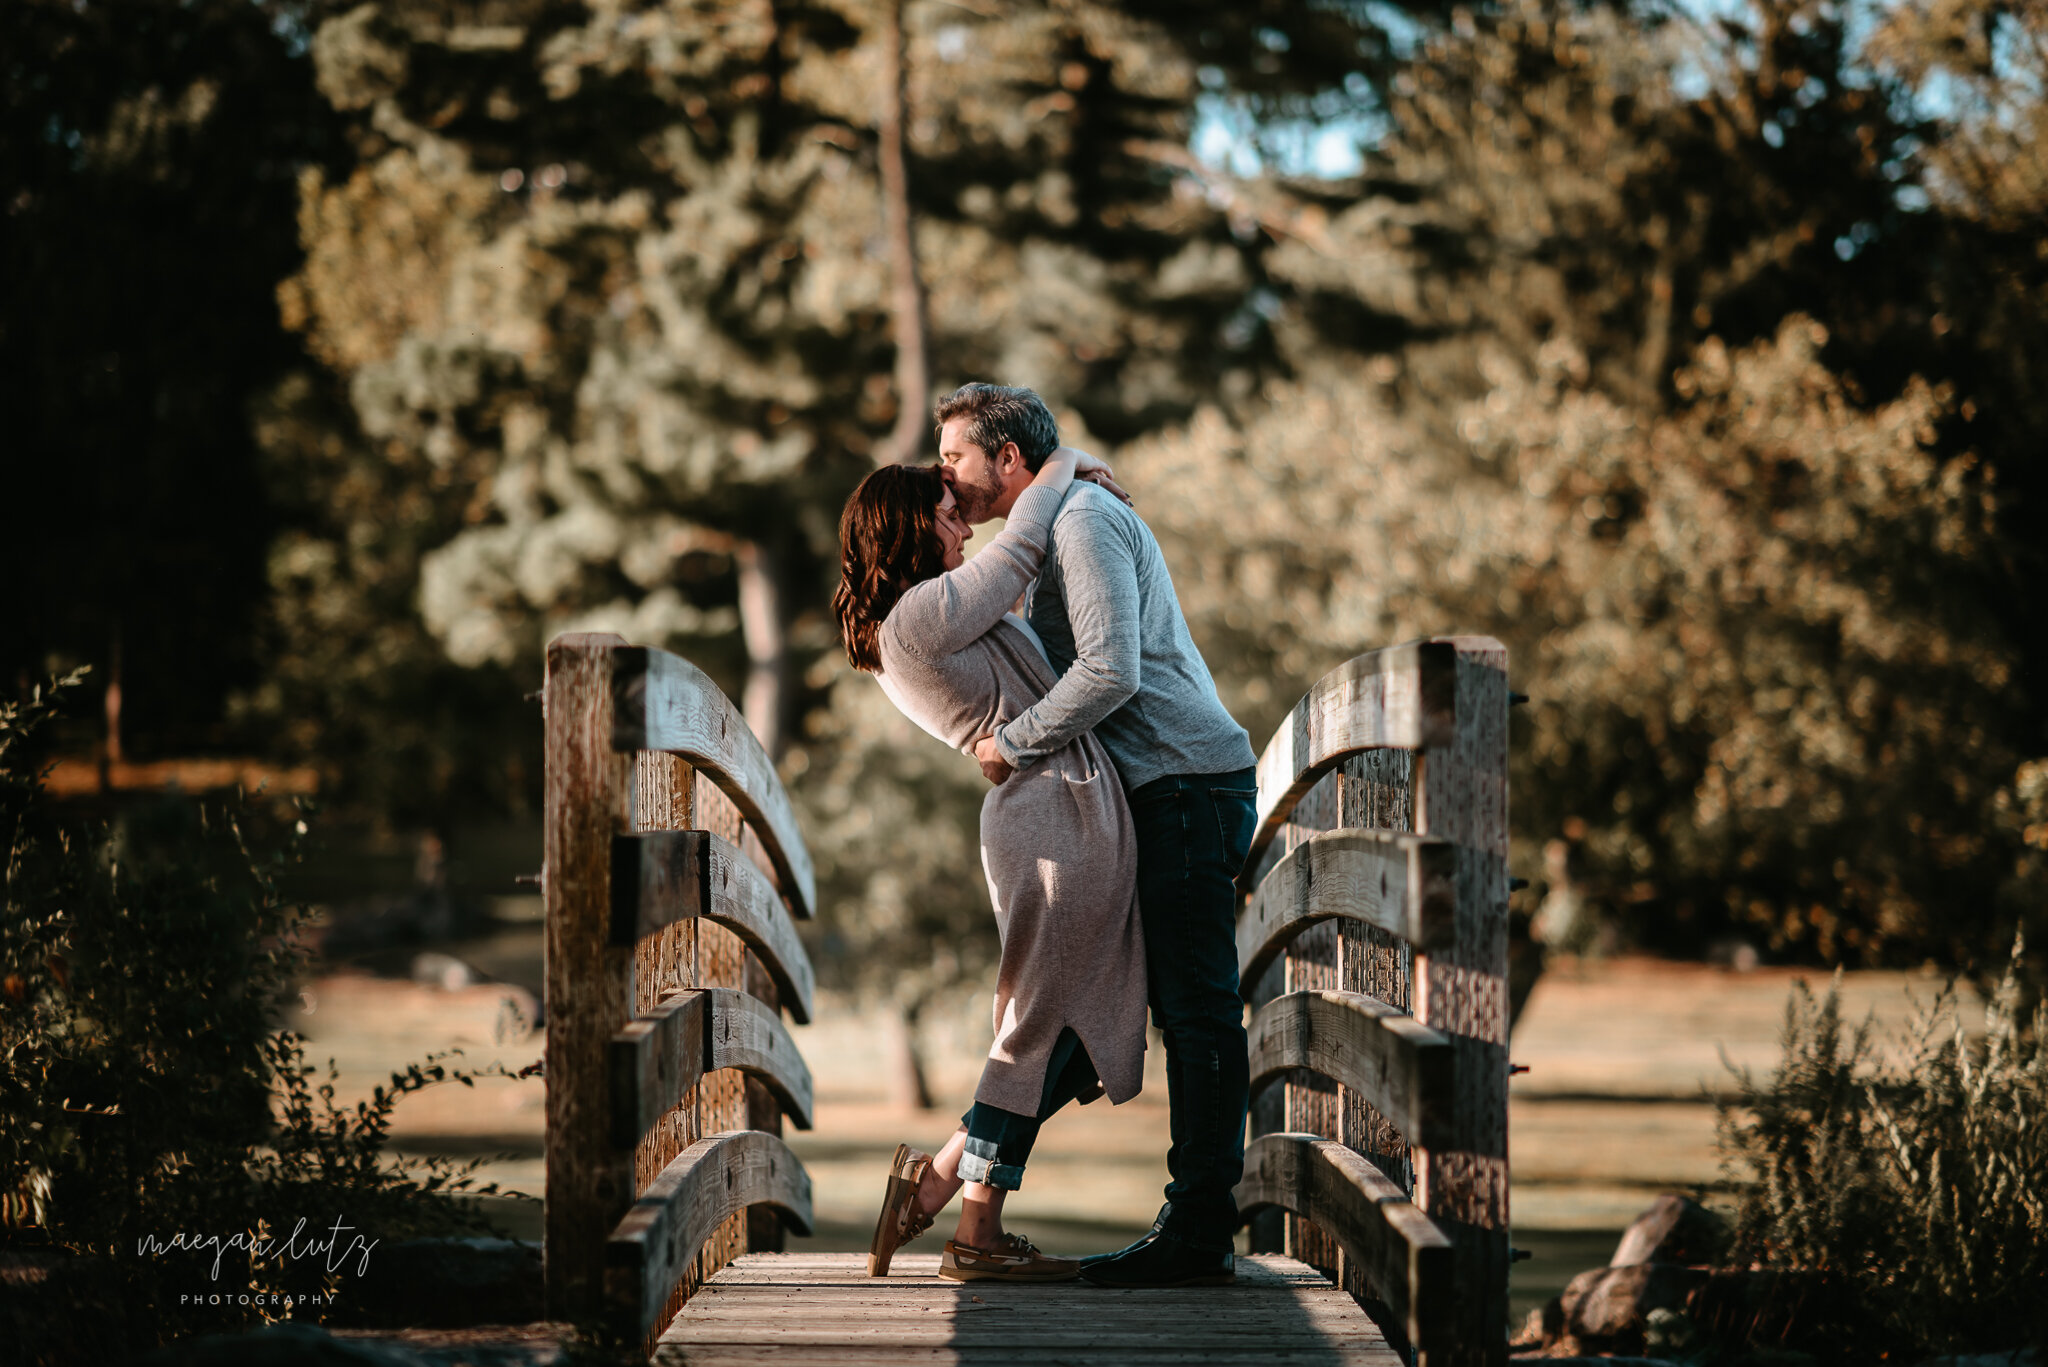 NEPA-Lehigh-Valley-Wedding-Engagement-photographer-at-the-rose-garden-allentown-PA-13.jpg